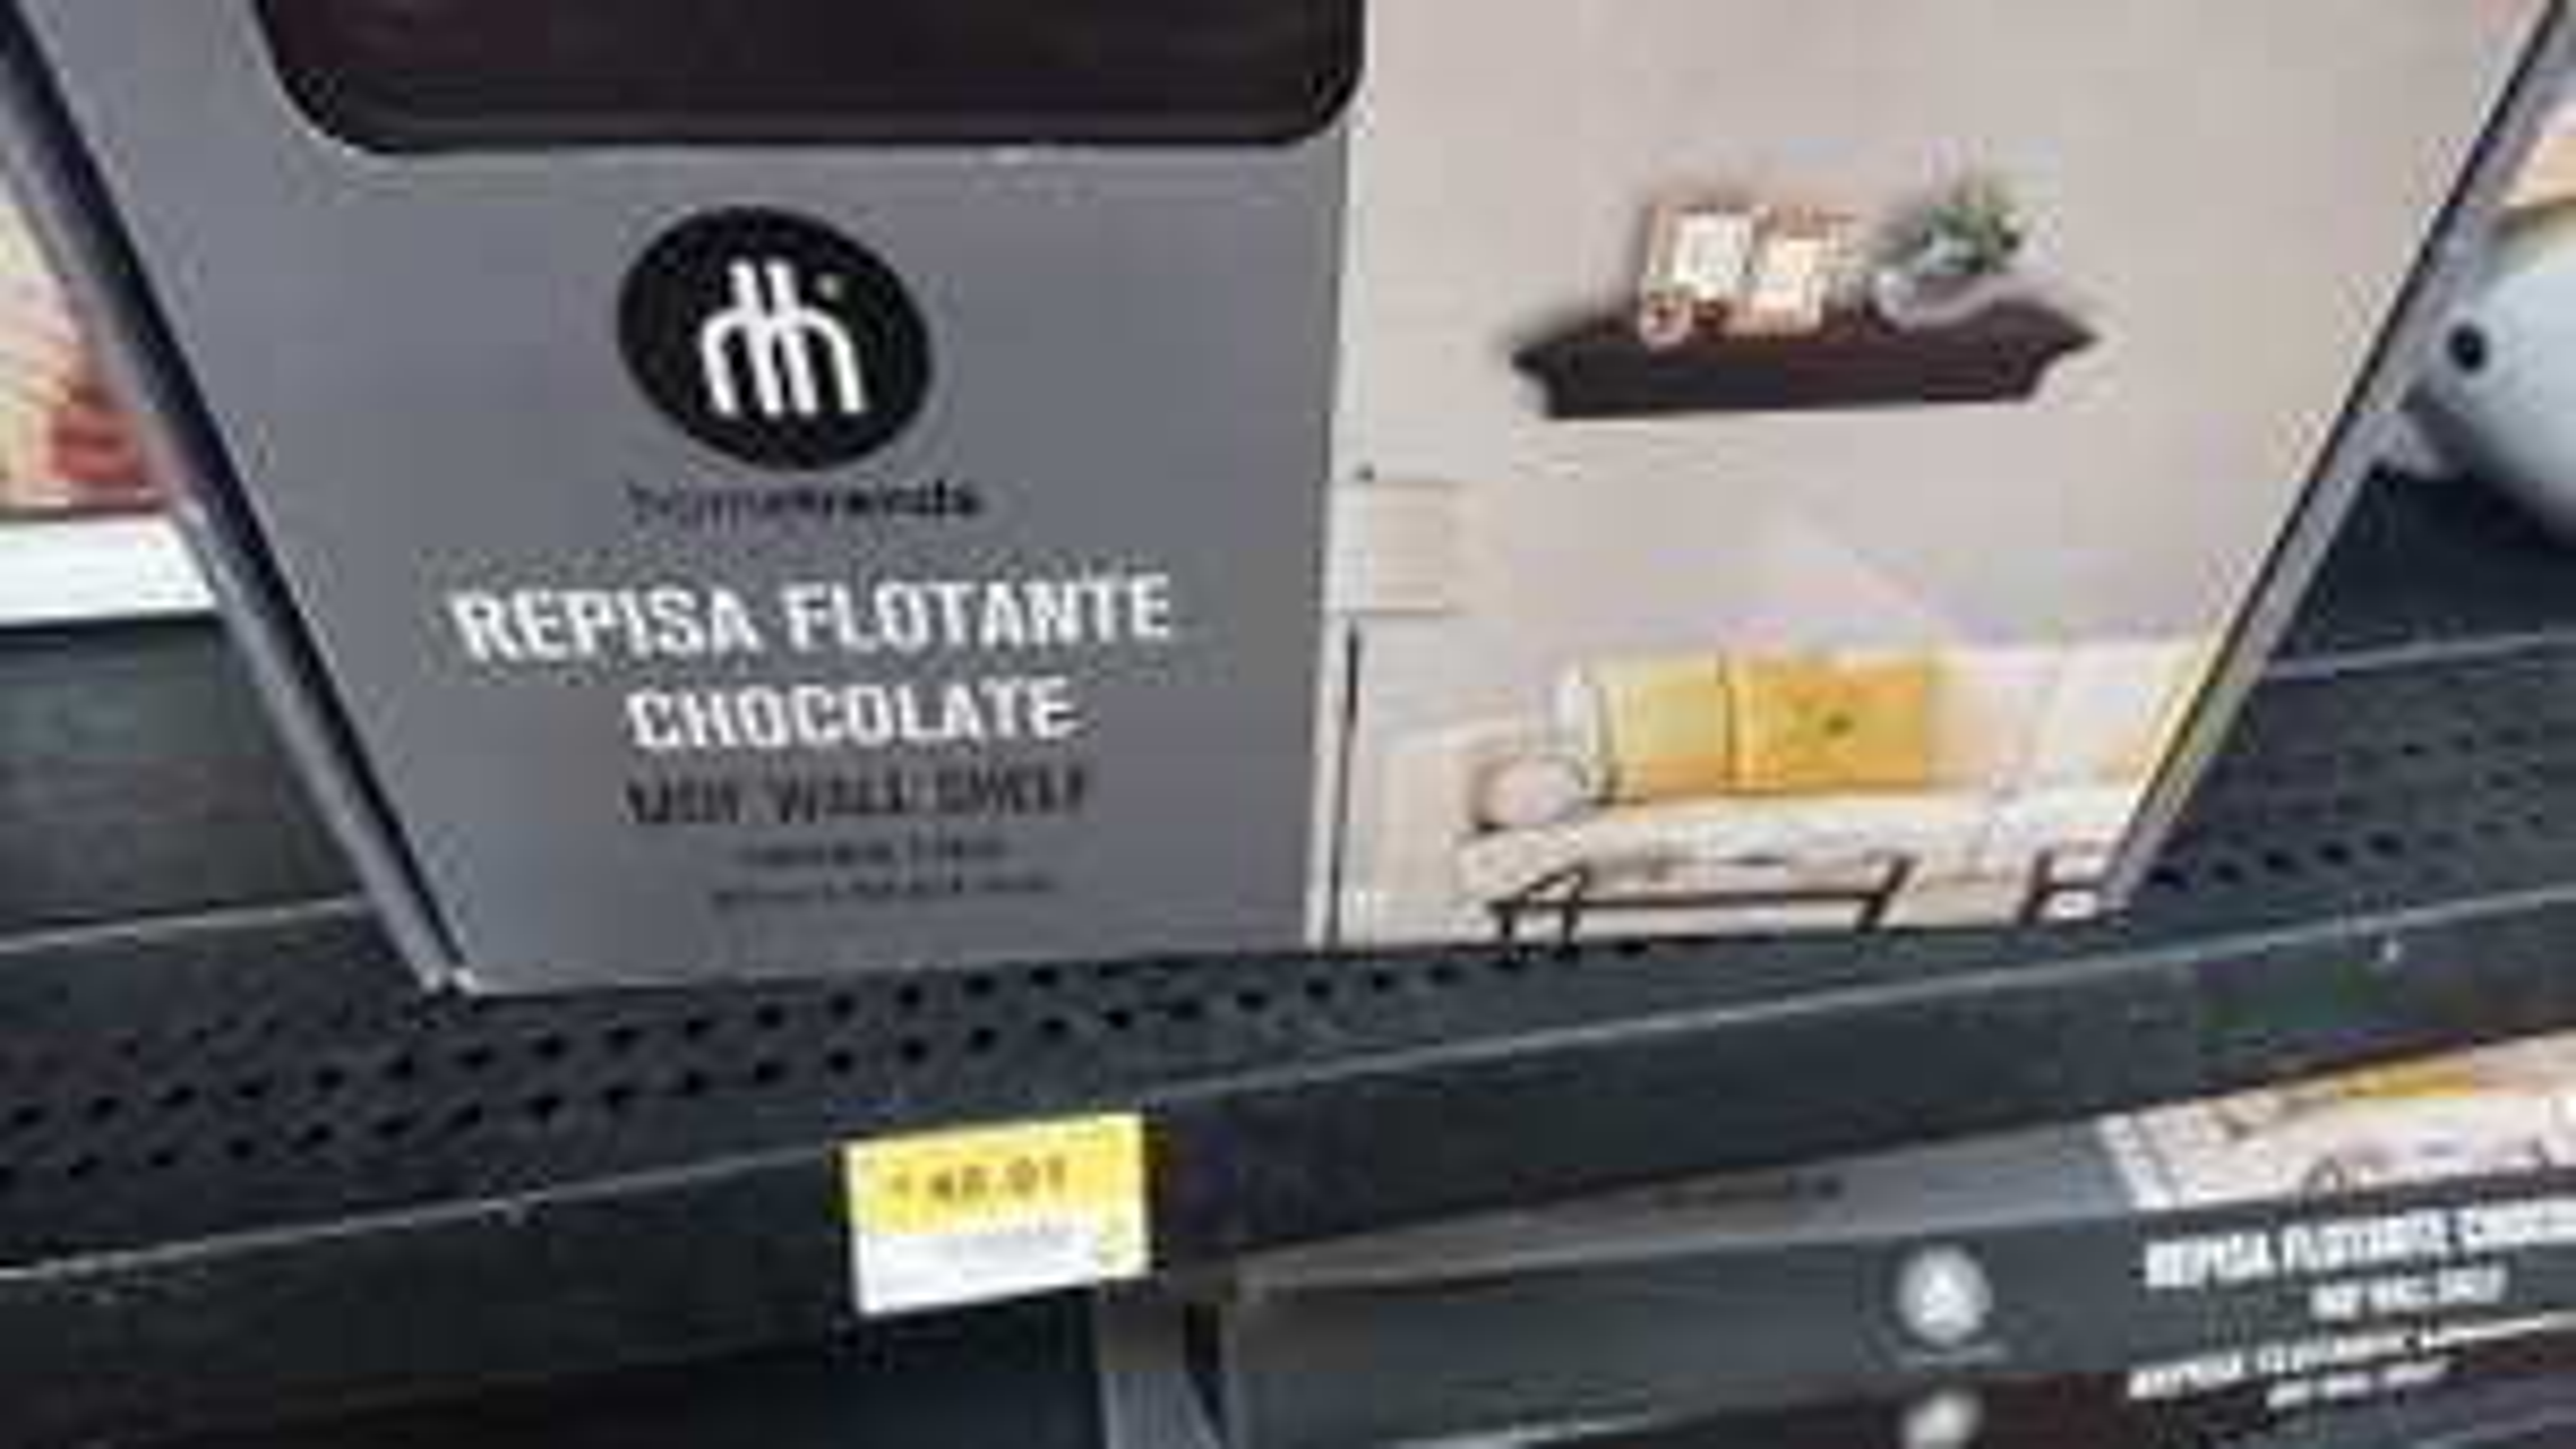 Walmart - Set de repisas flotantes hometrends en última liquidación